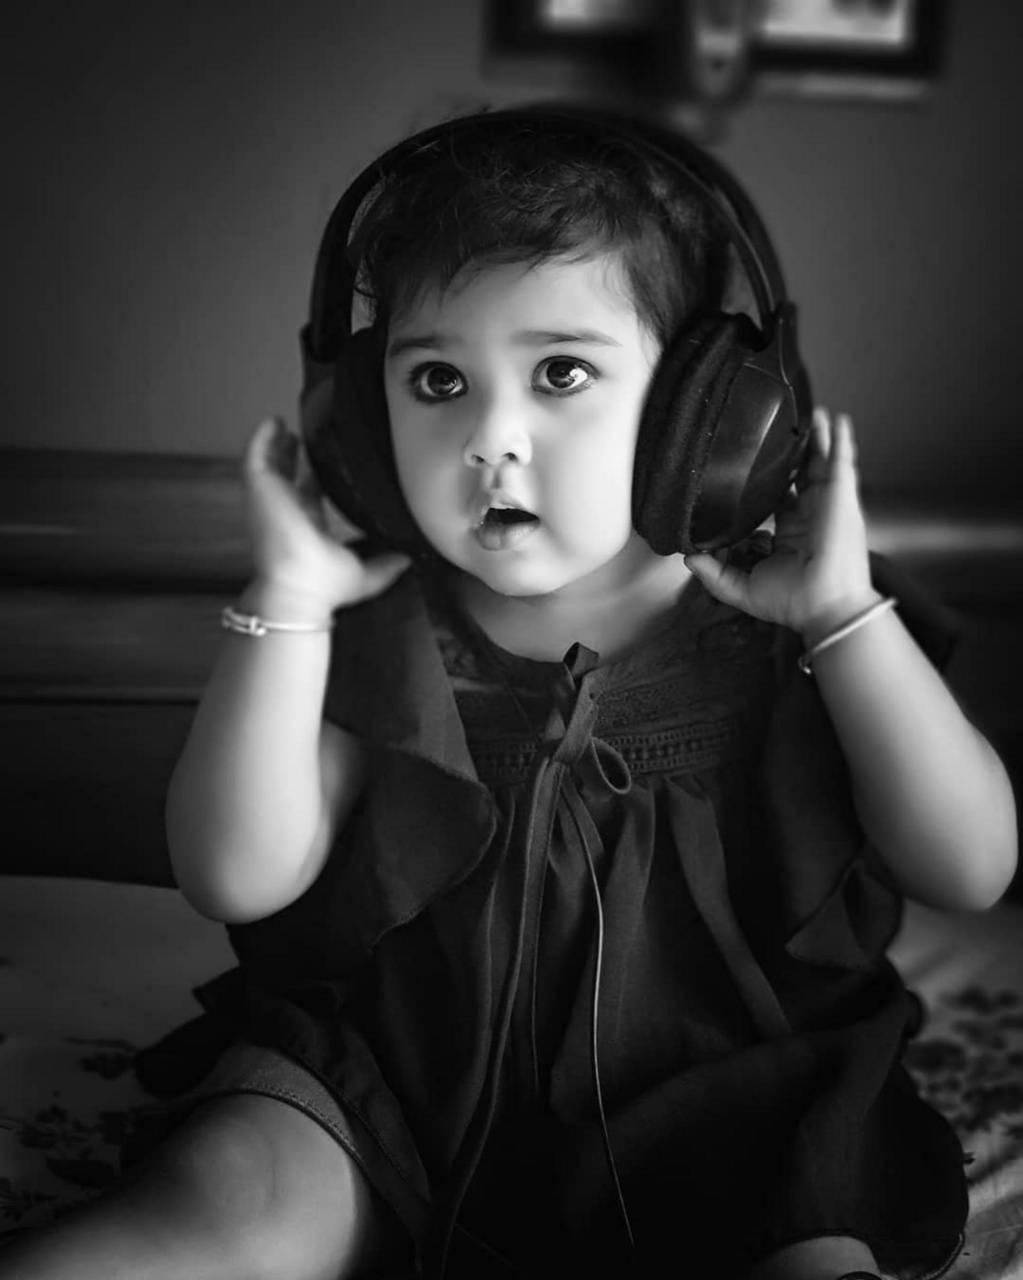 Cute listener